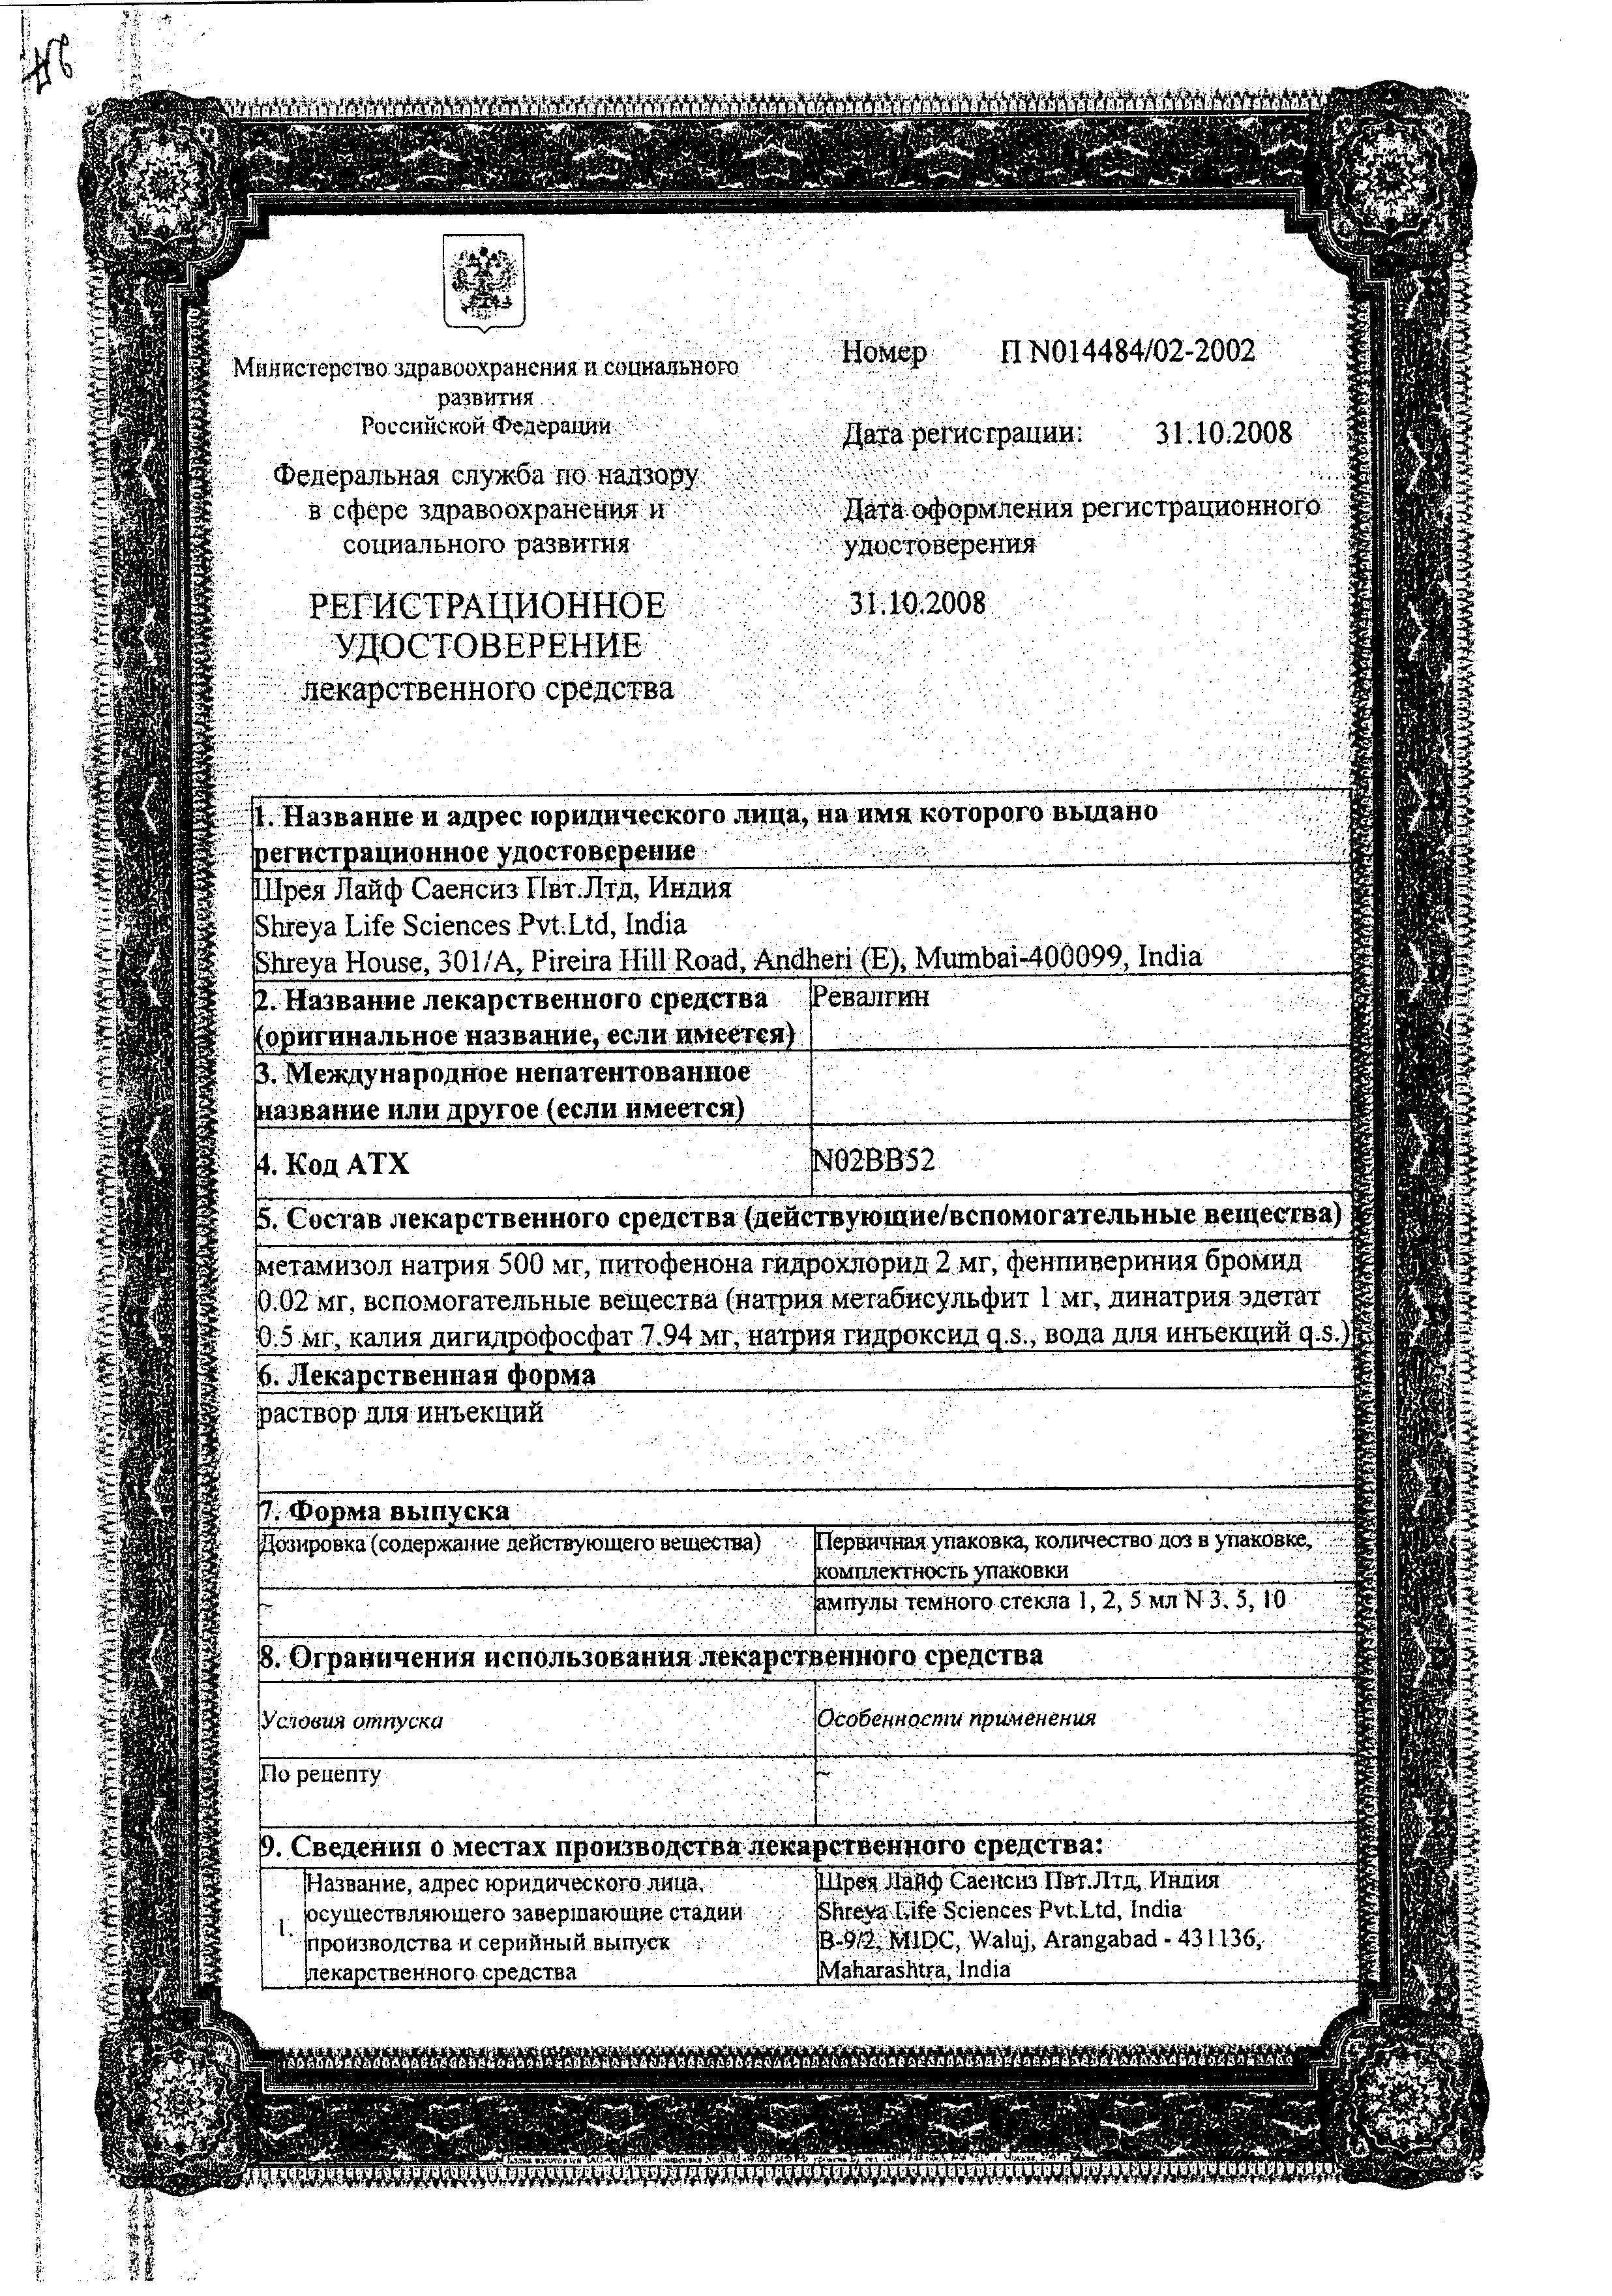 Ревалгин сертификат